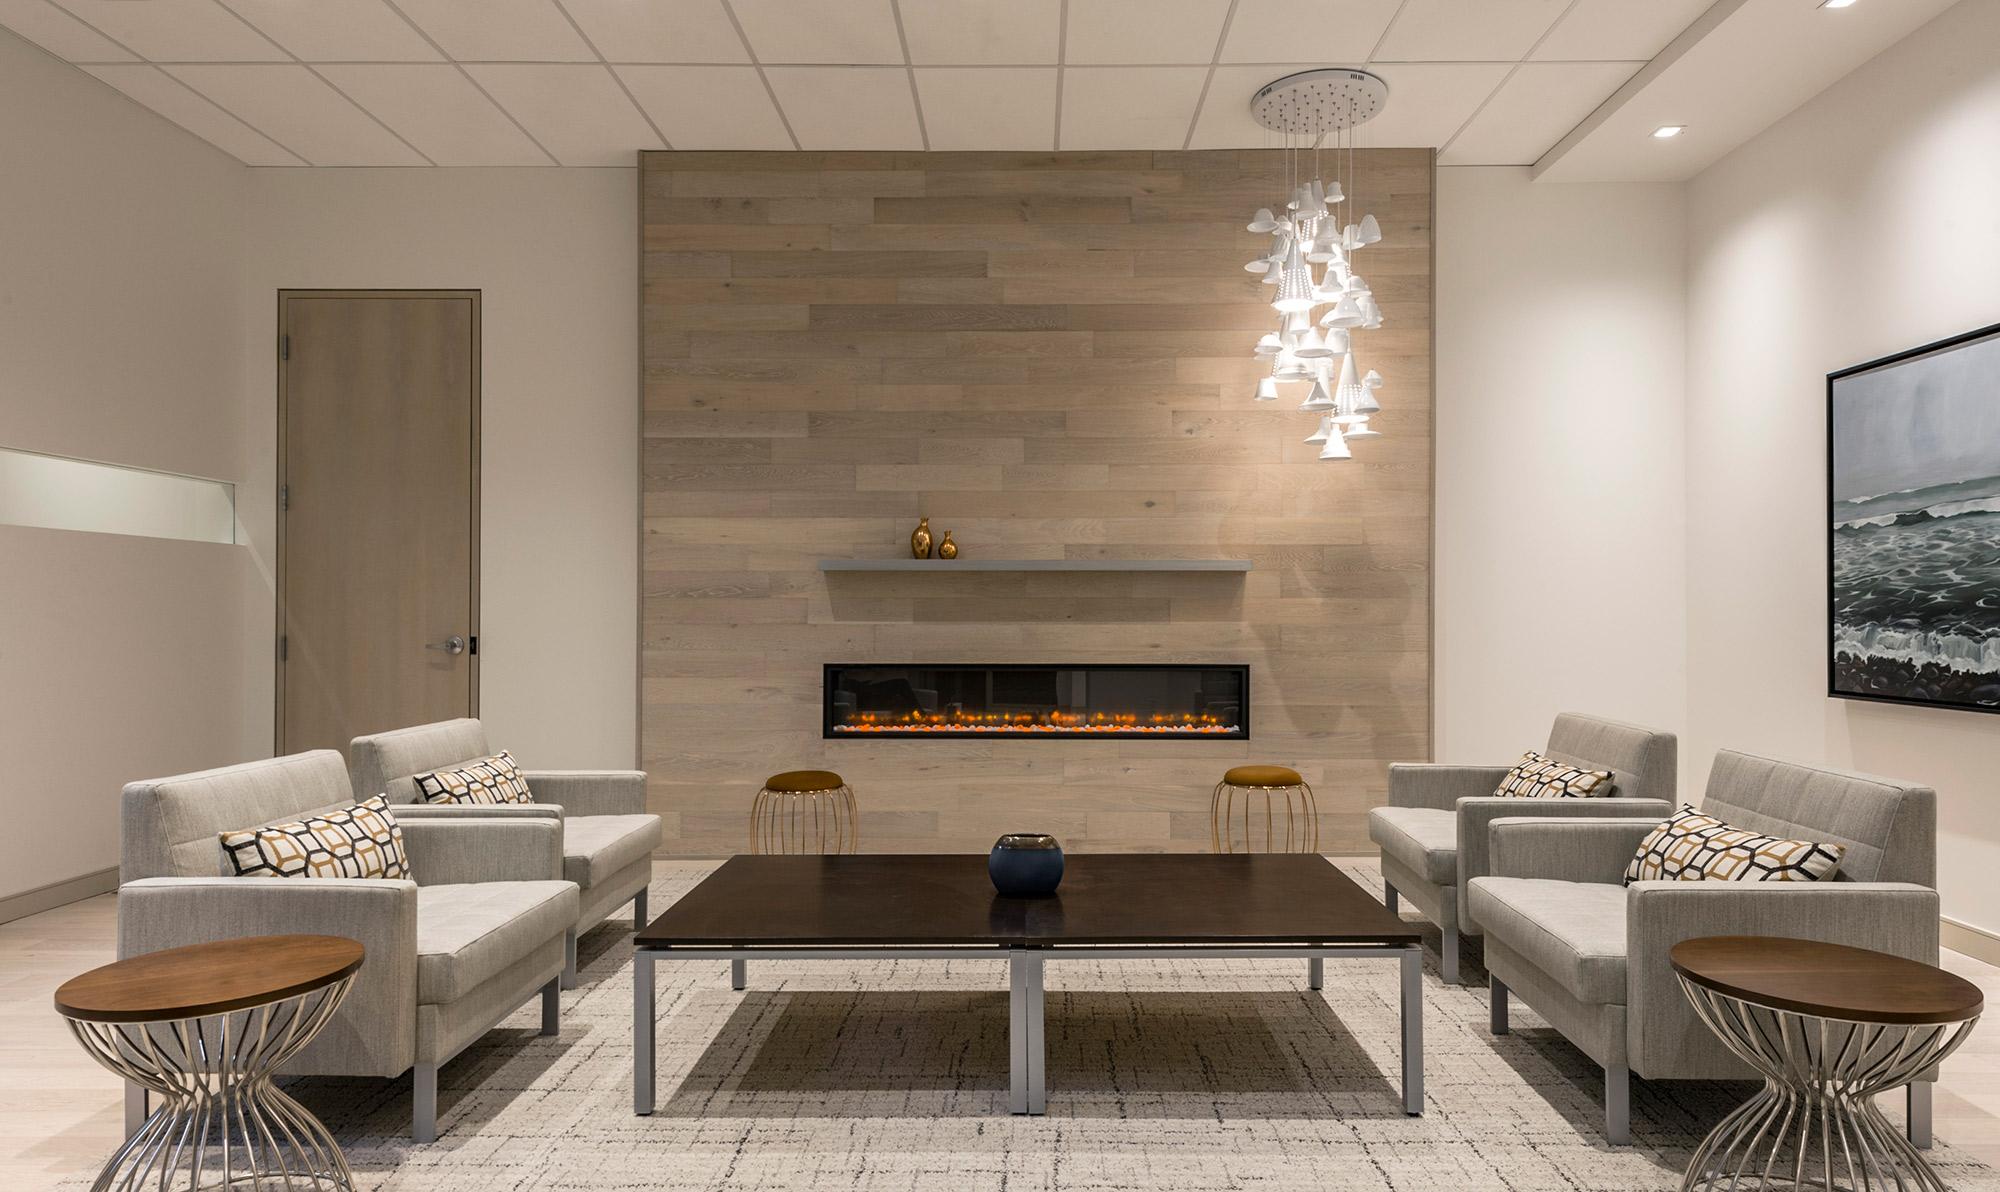 interior-design-legal-office-fireplace.jpg